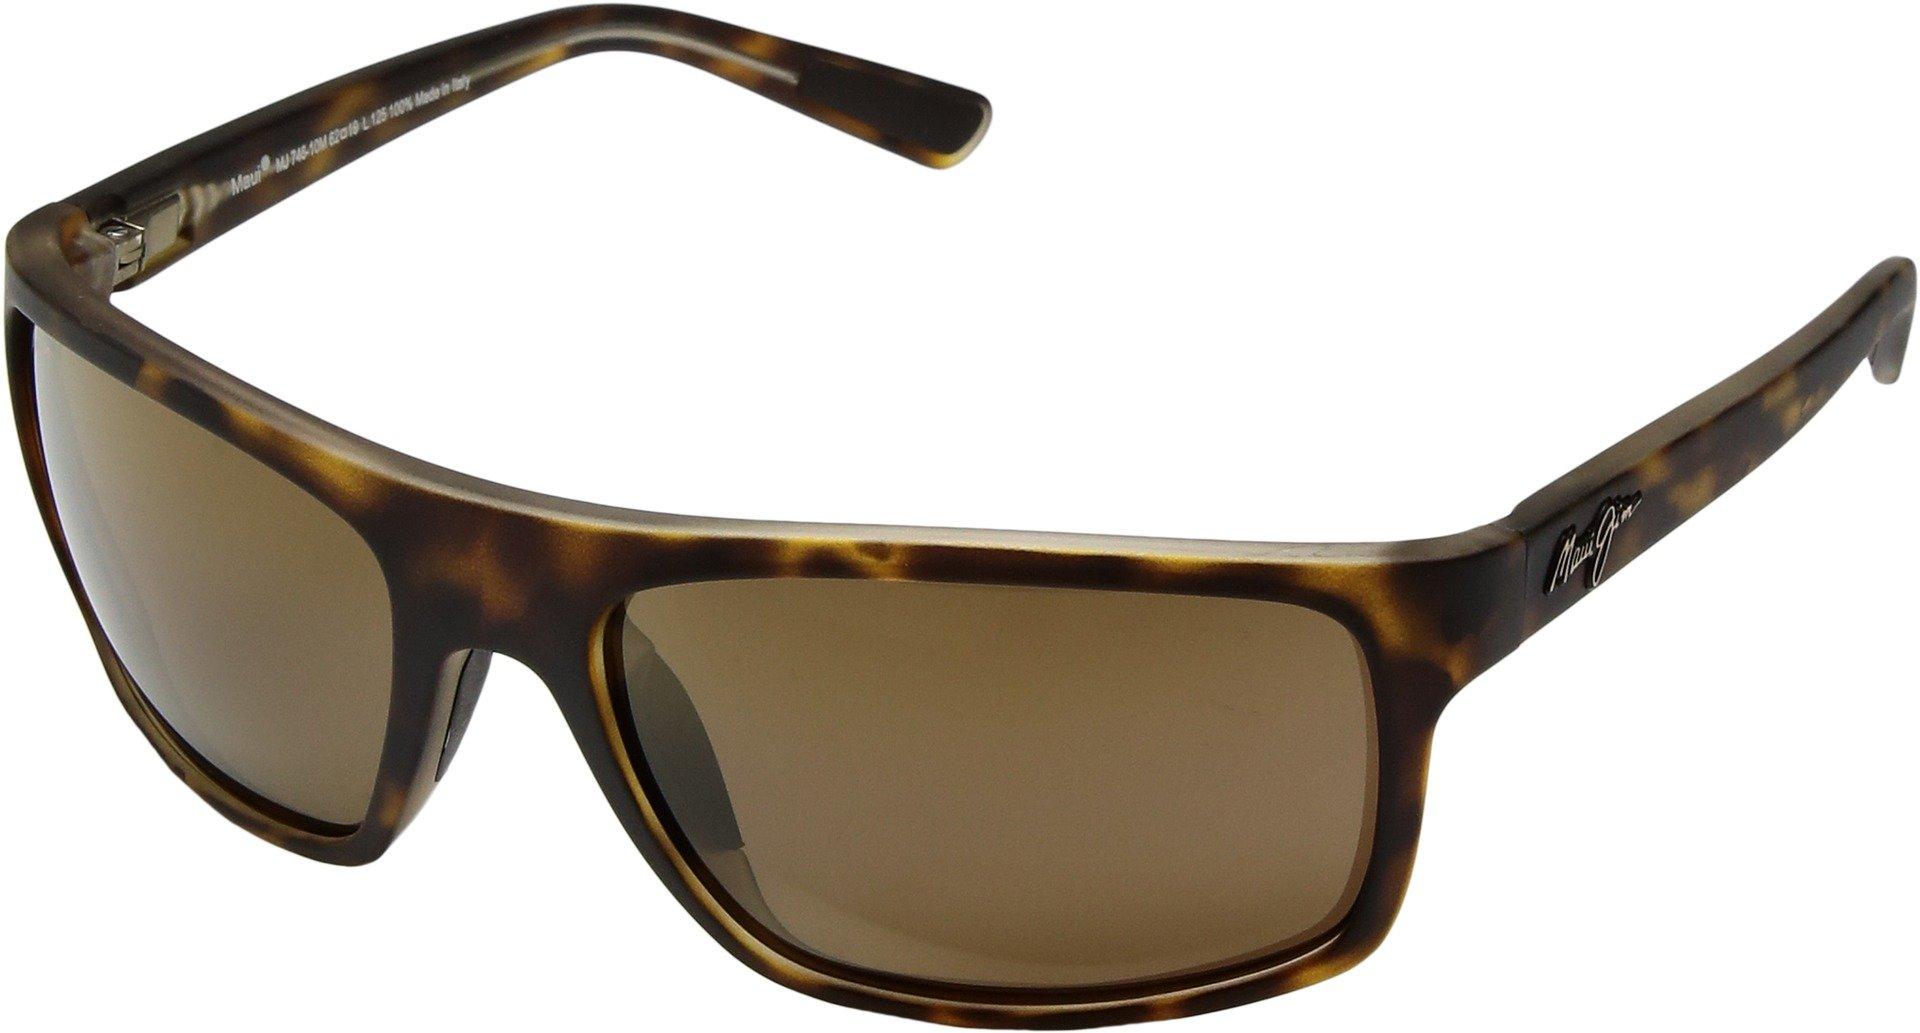 Maui Jim Byron Bay H746-10M | Polarized Matte Tortoise Wrap Frame Sunglasses, HCL Bronze Lenses, with Patented PolarizedPlus2 Lens Technology by Maui Jim